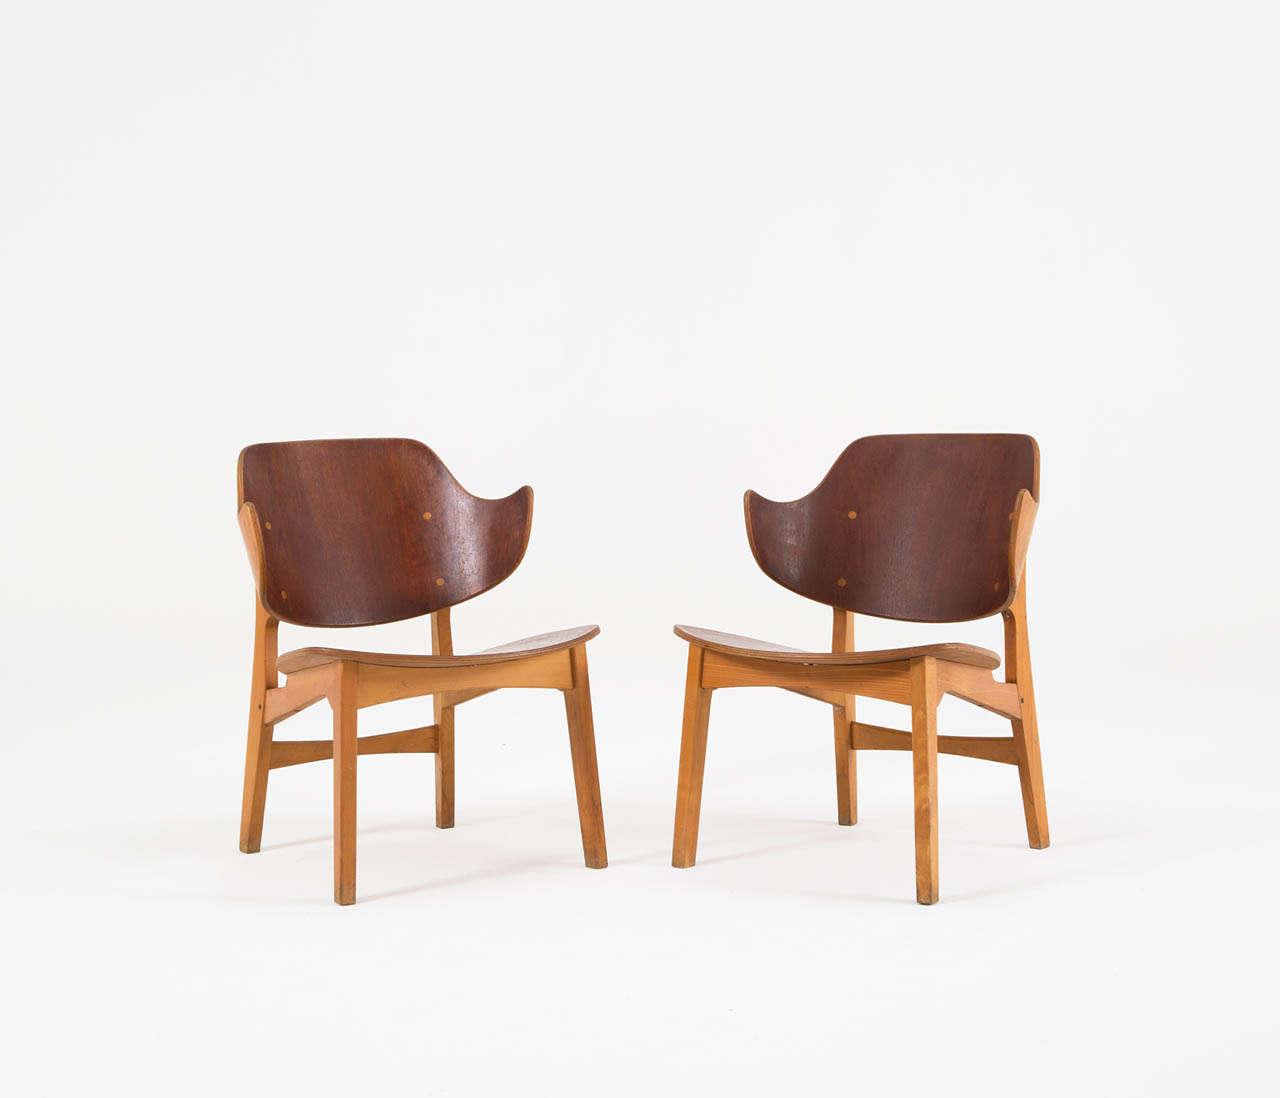 Danish Pair of Plywood Lounge Chairs by Ib Kofod-Larsen